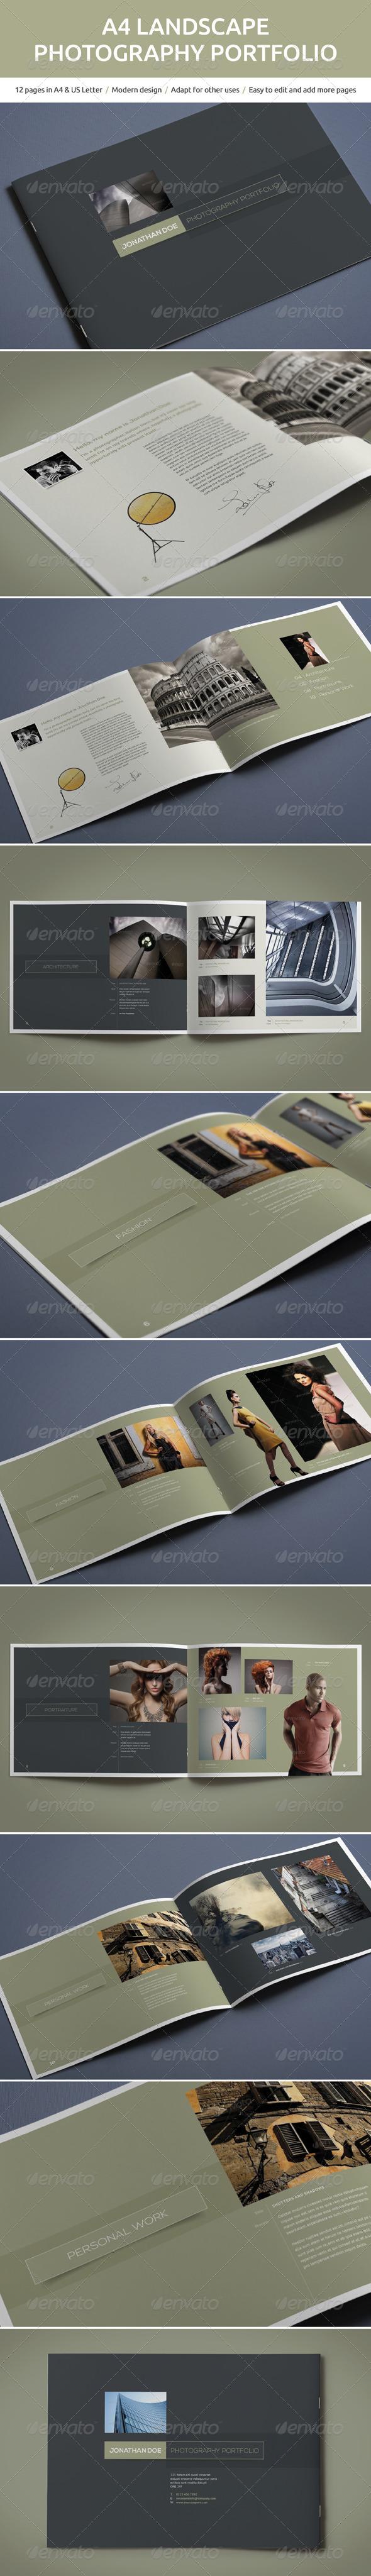 A4 Landscape Photography Portfolio - Portfolio Brochures